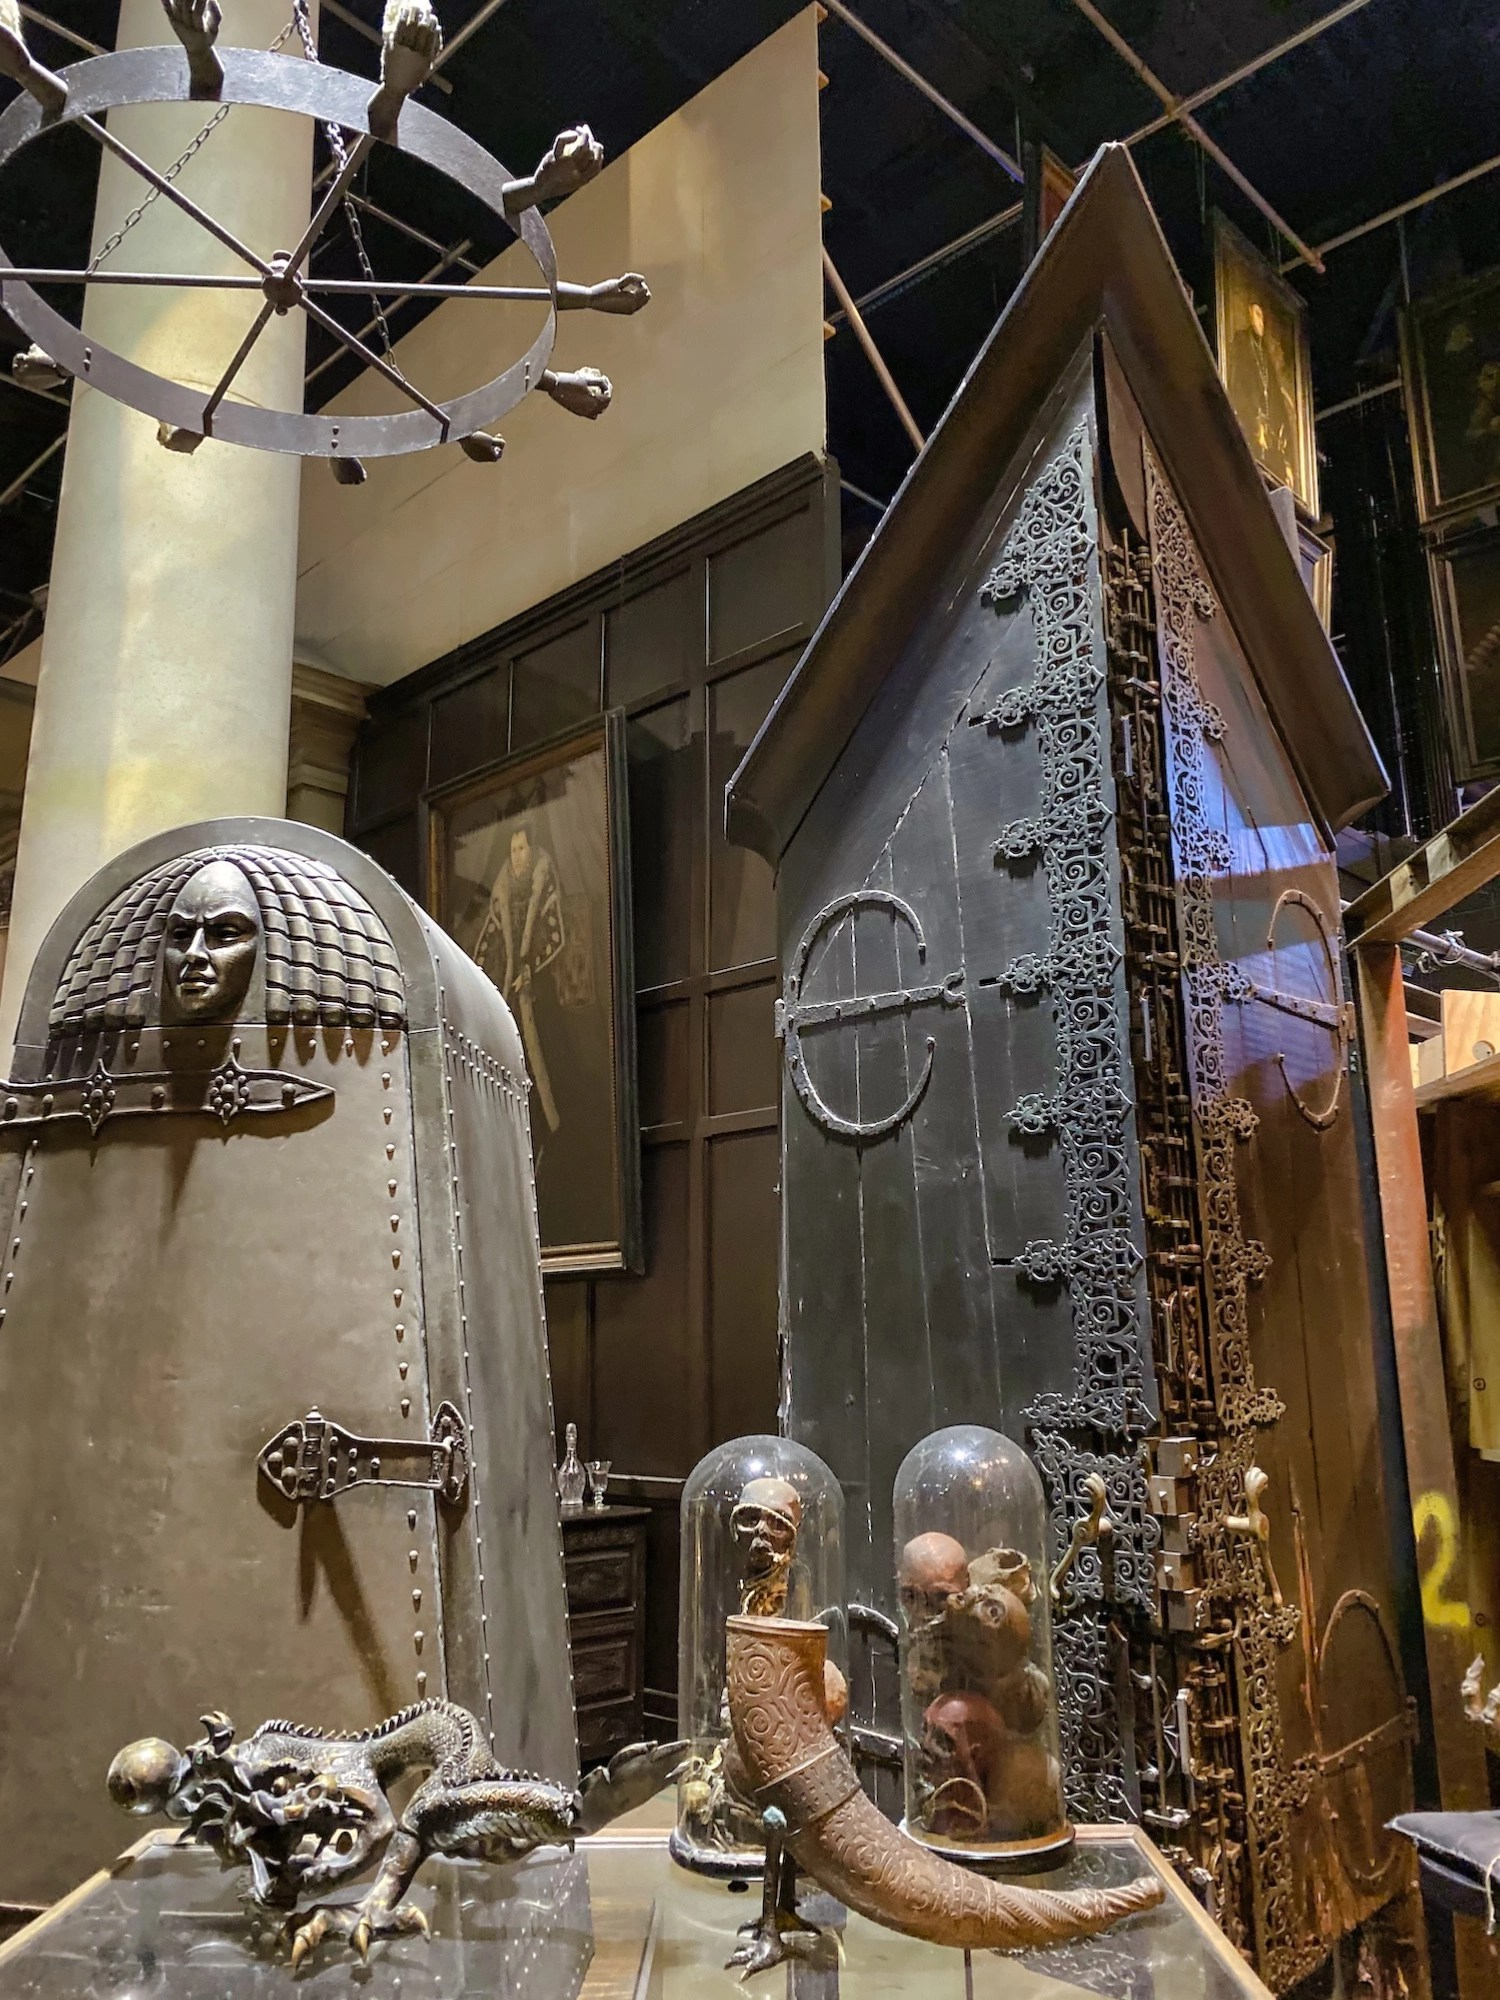 Harry Potter Studio Tour - Dark Arts